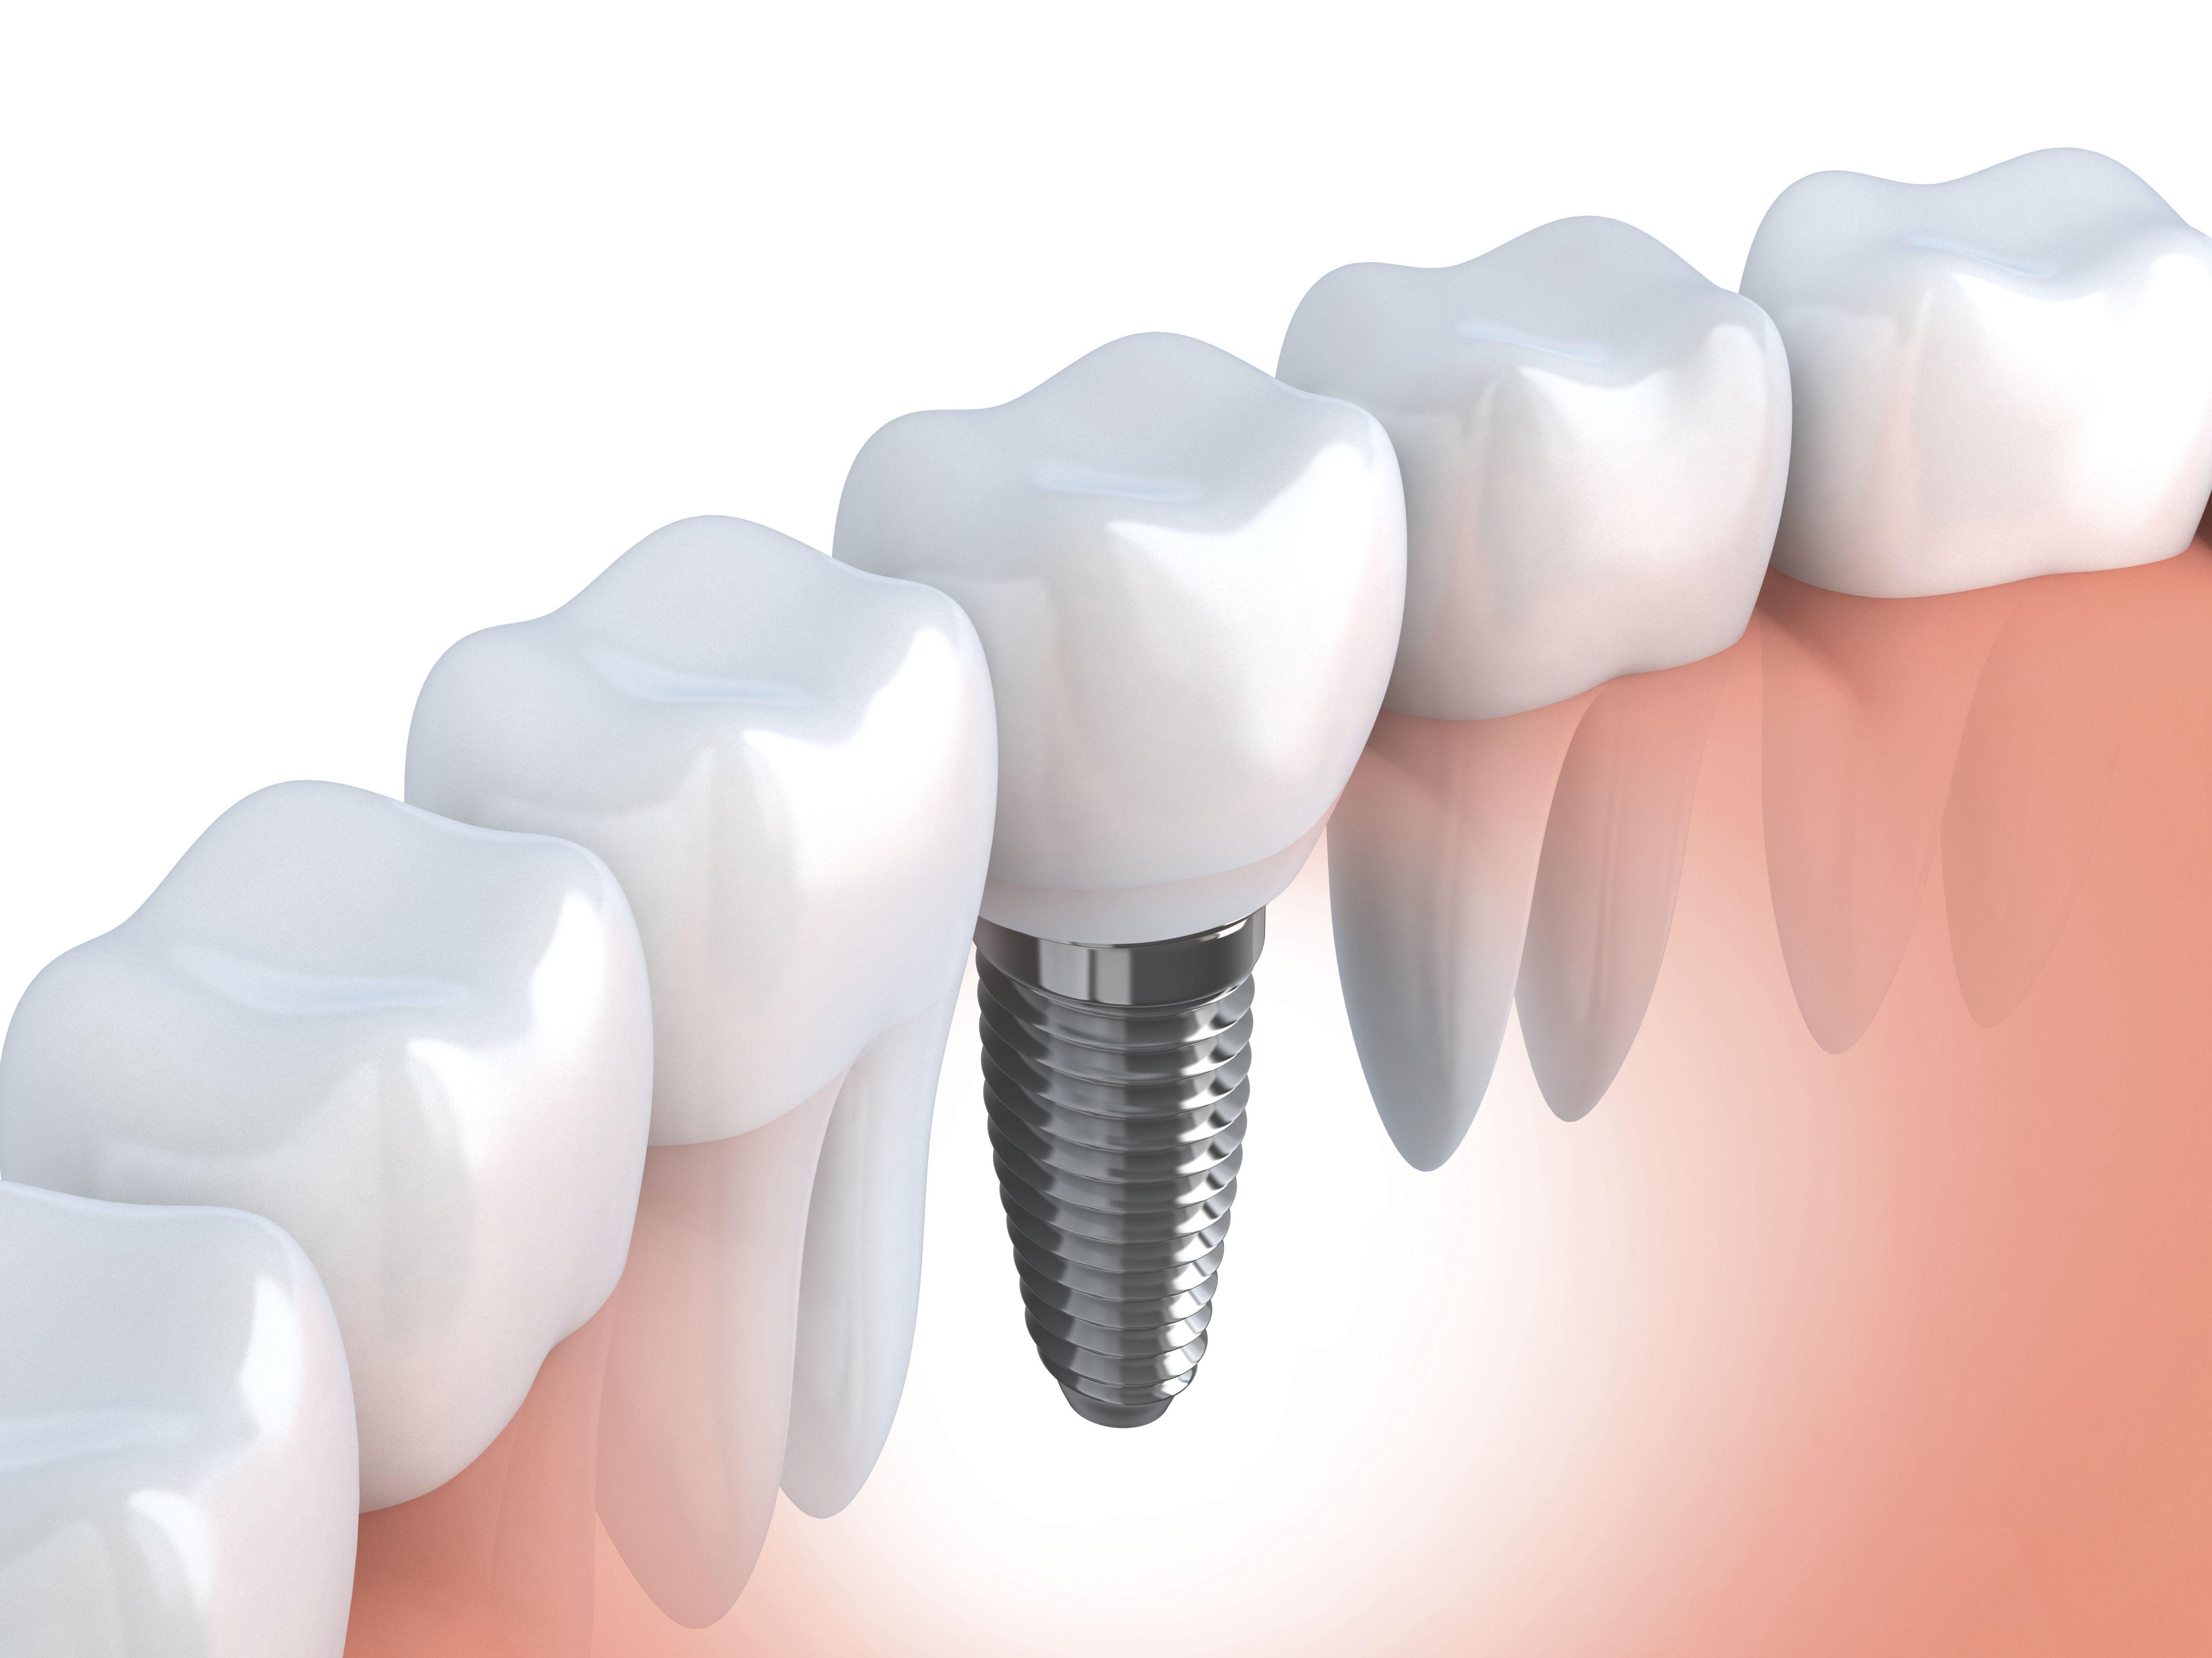 Implantología dental en la Clínica Valloc en Palau-solità i Plegamans